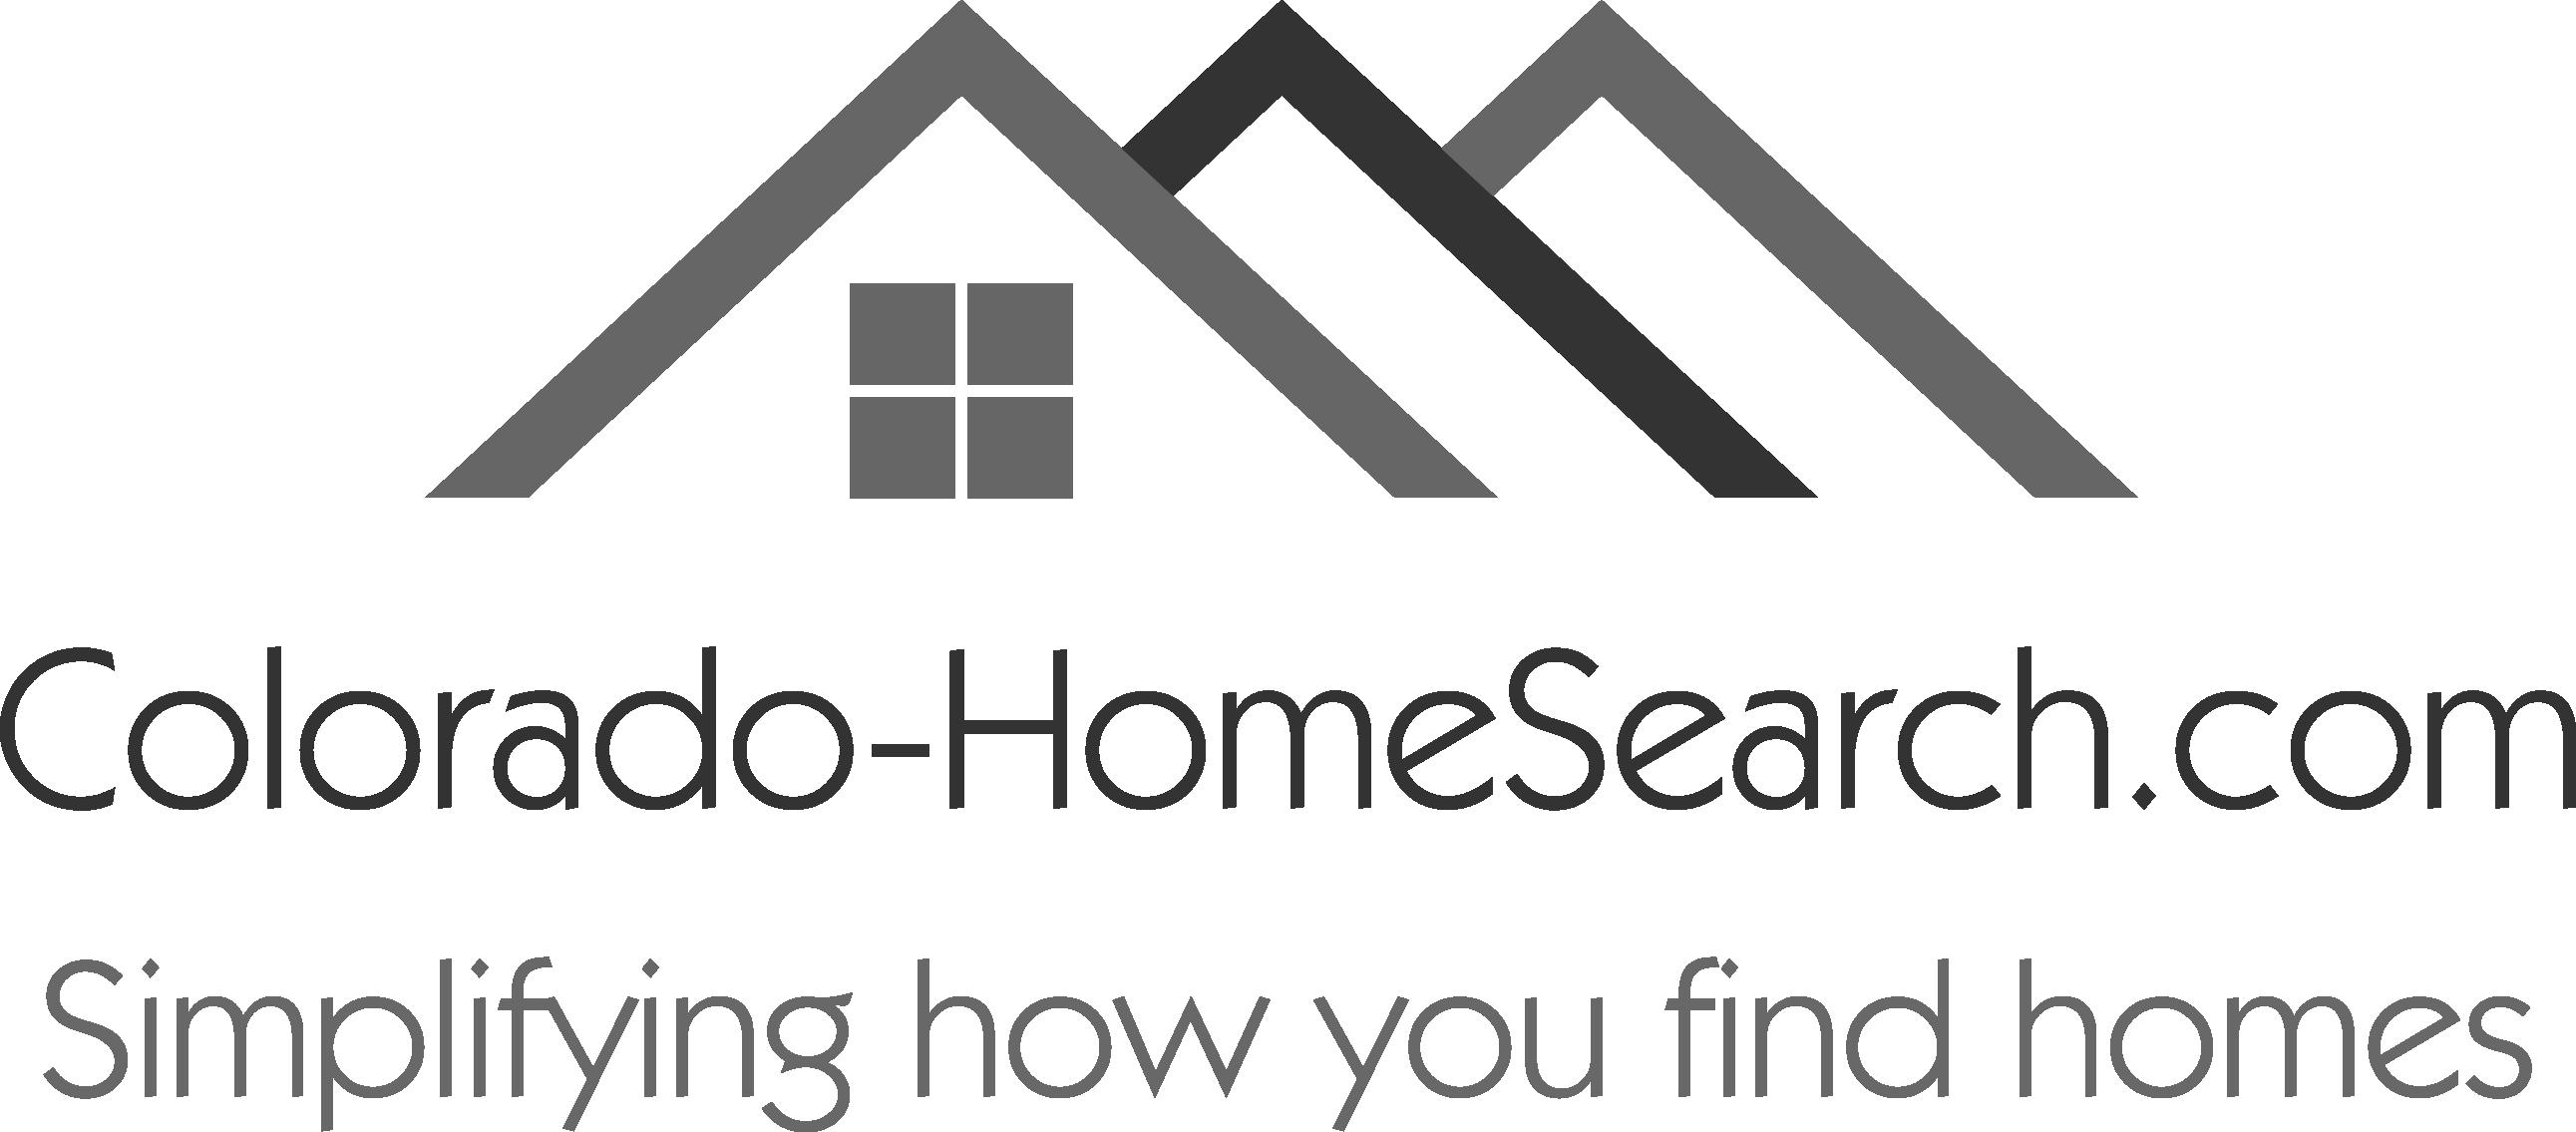 Colorado Home Search